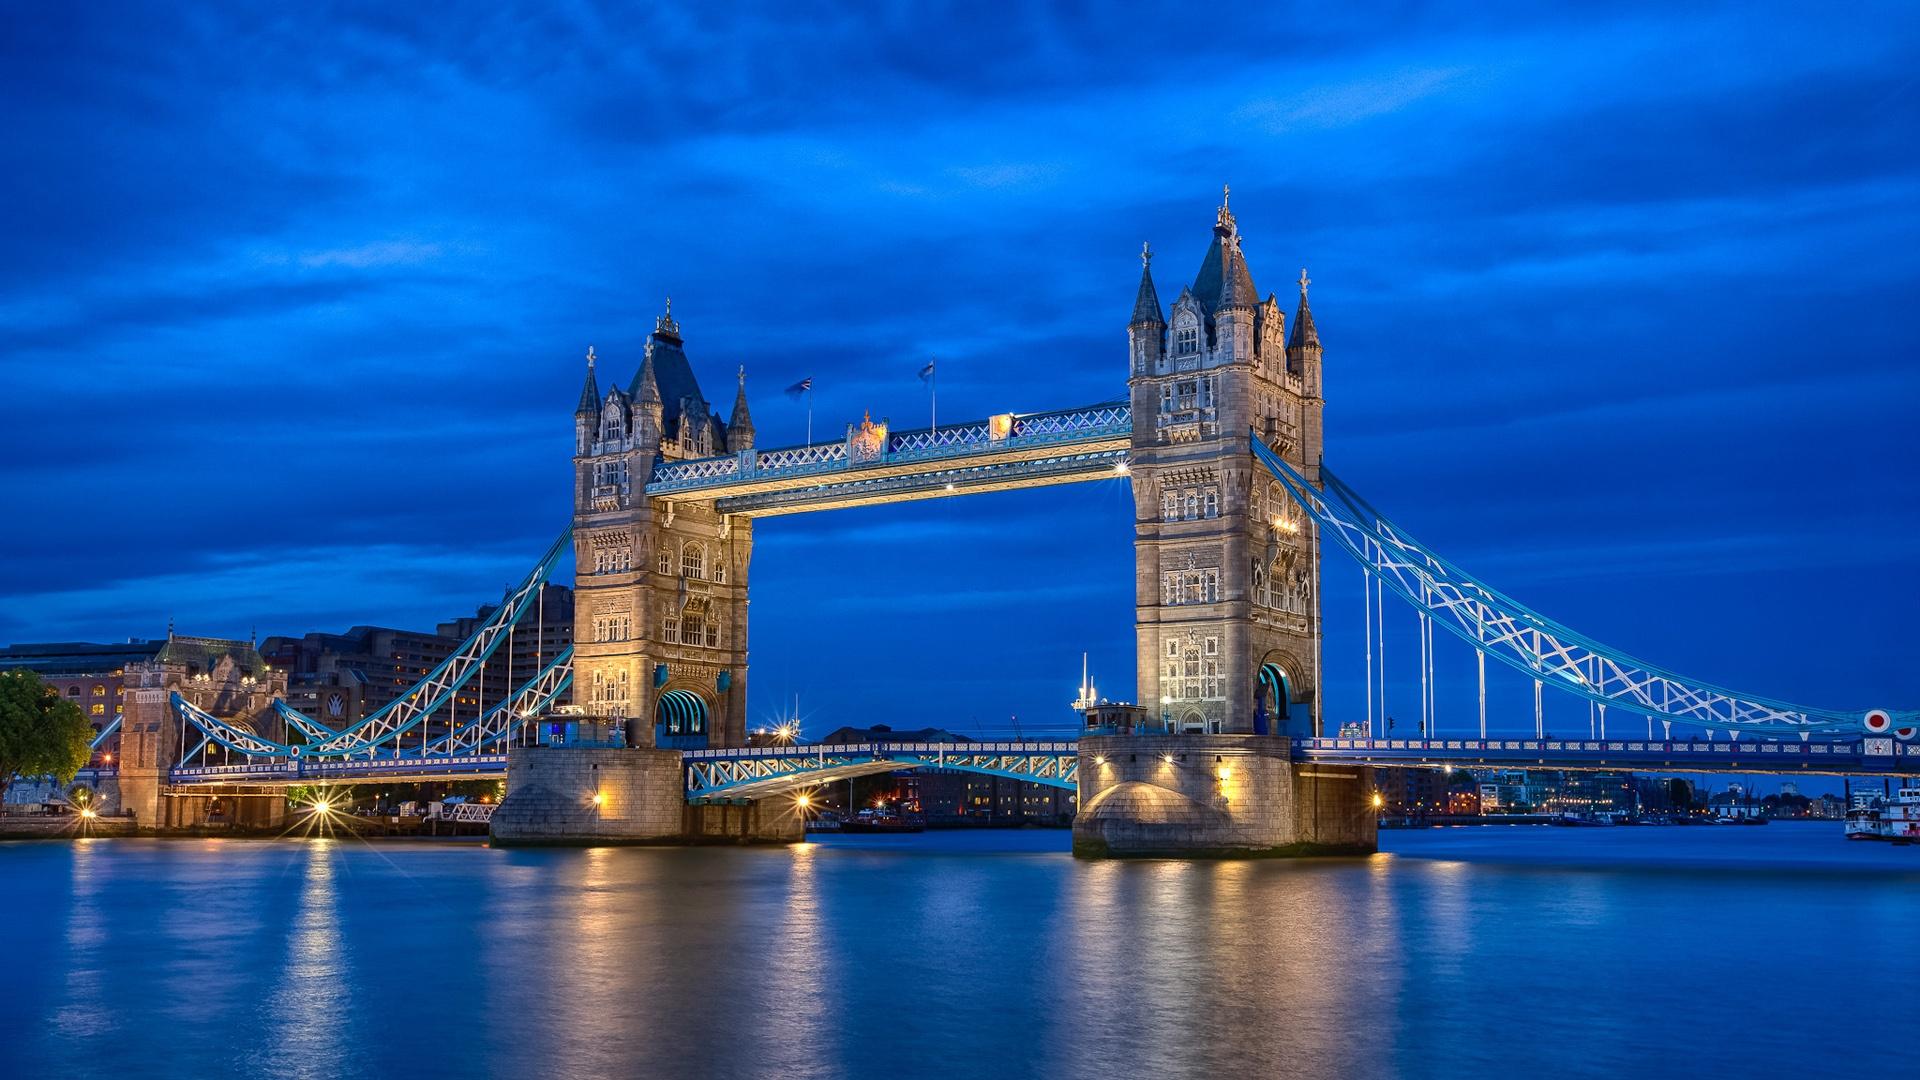 England-London-city-night-river-Thames-Tower-Bridge-blue-sky-lights_1920x1080